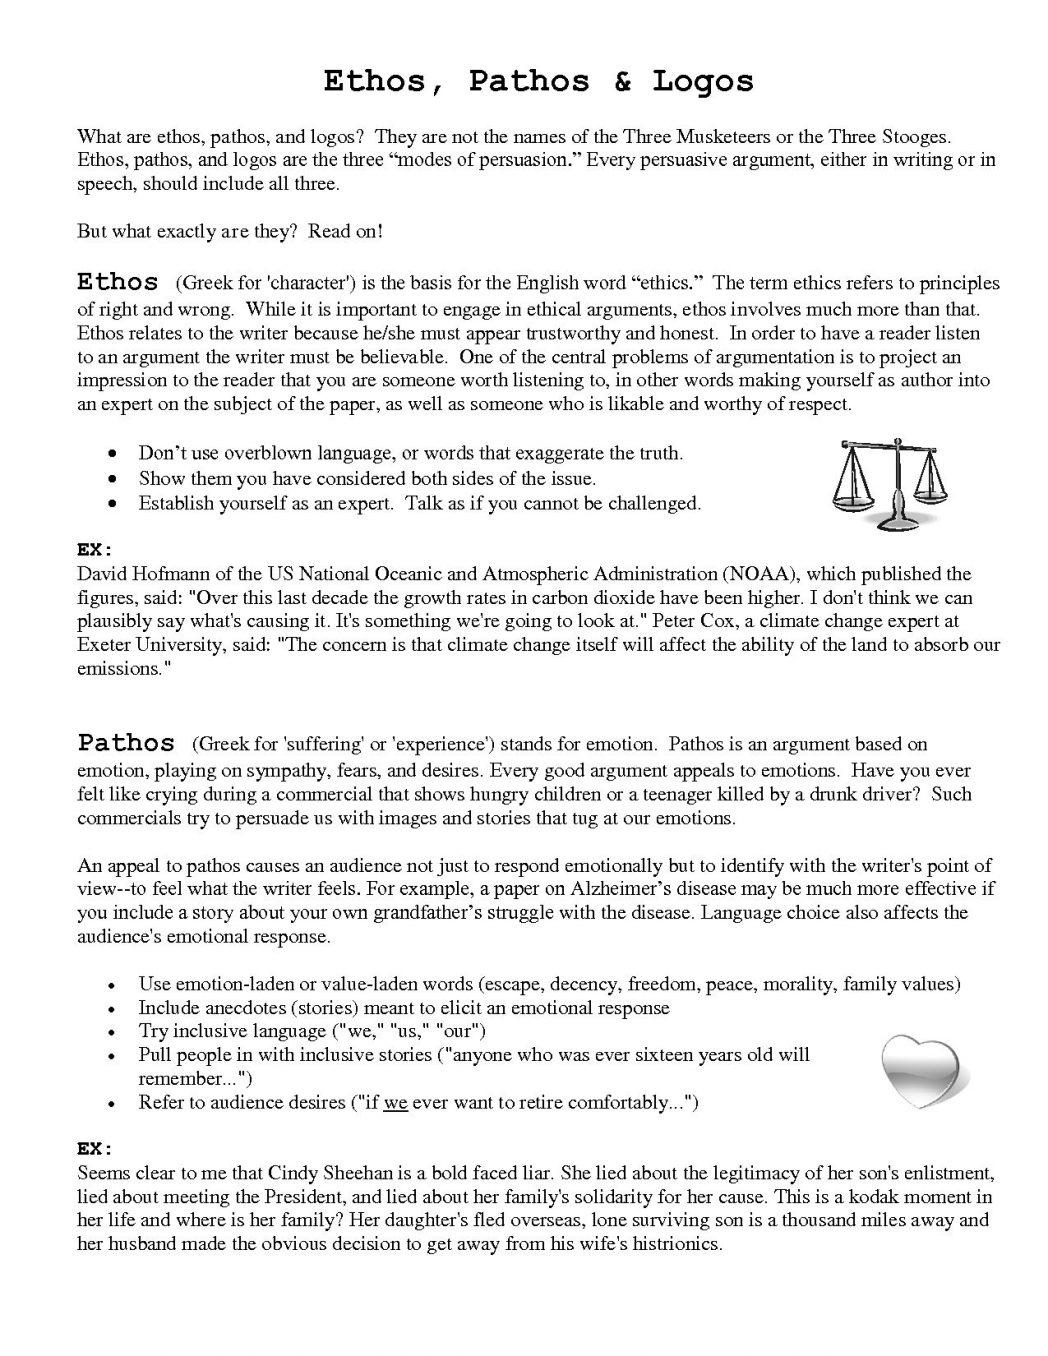 017 Essayxamplethos Pathos Logos For School Pinterestnglish And Of Rhetorical Analysis Using Pdf 1048x1356 Letter From Birmingham Jail Top Ethos Essay Full